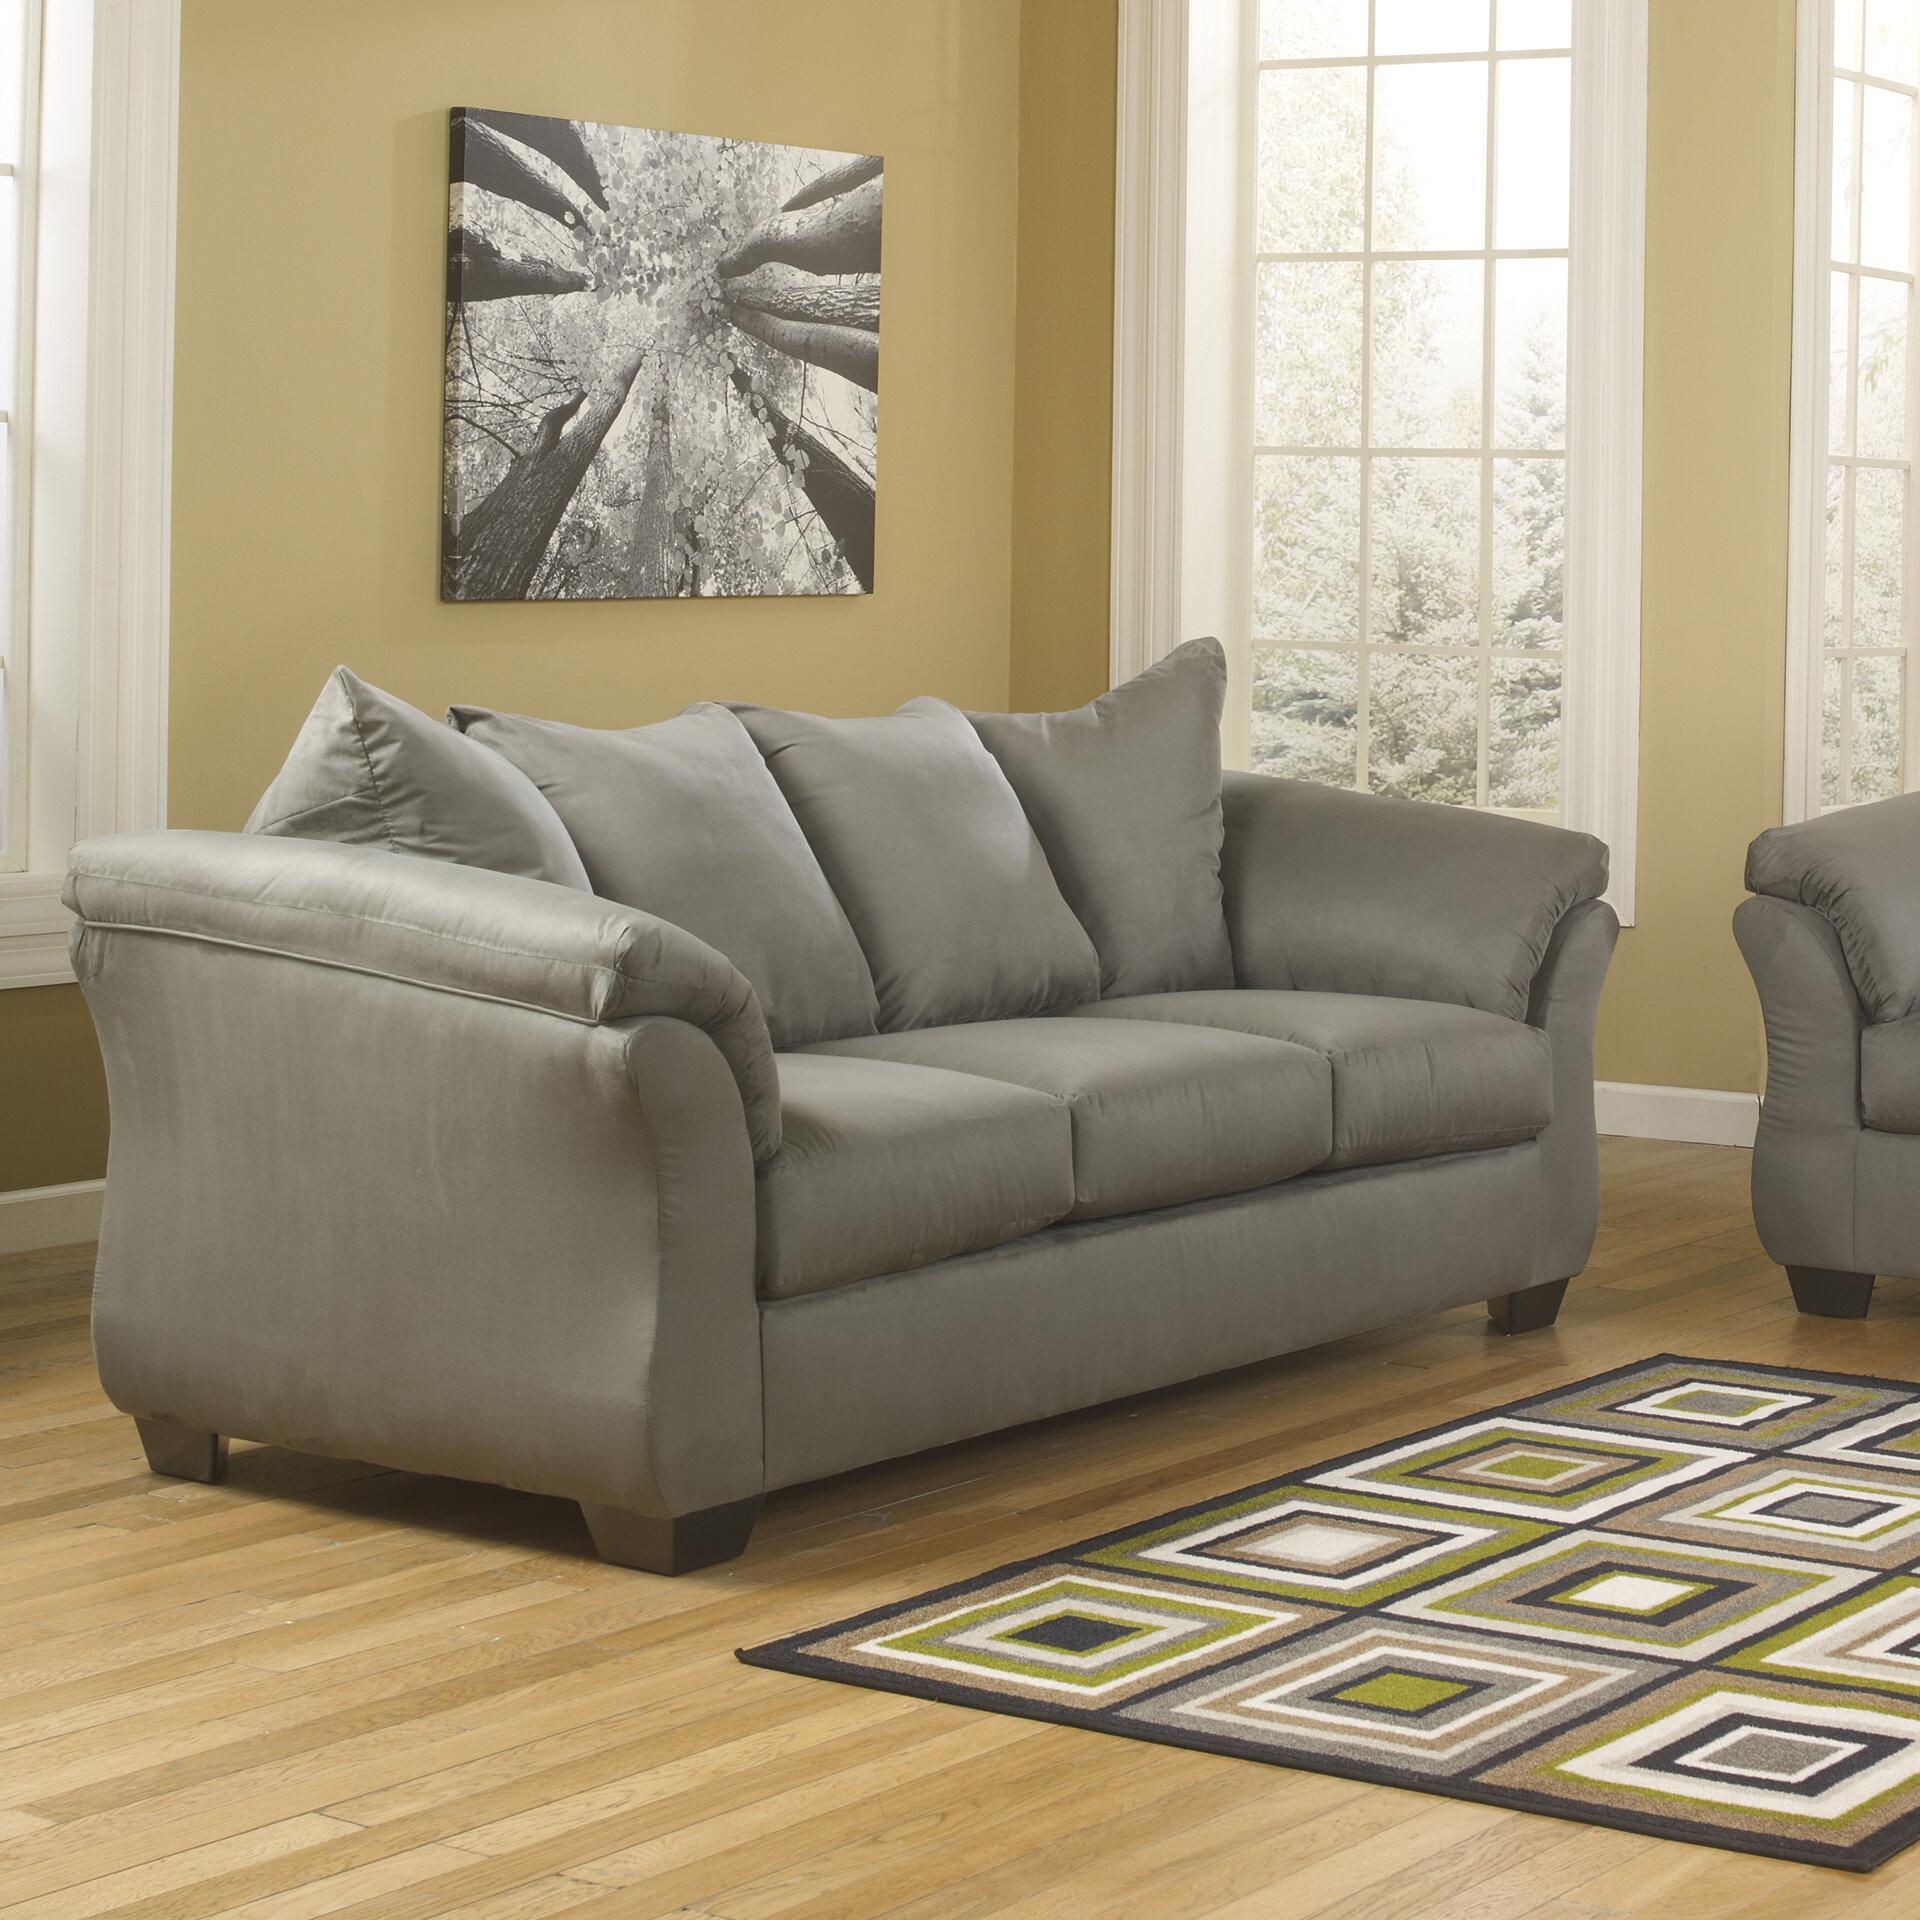 Harvest Sofa Cost To Ship Ashley Furniture Triumph Harvest Recliners Sofa Thesofa